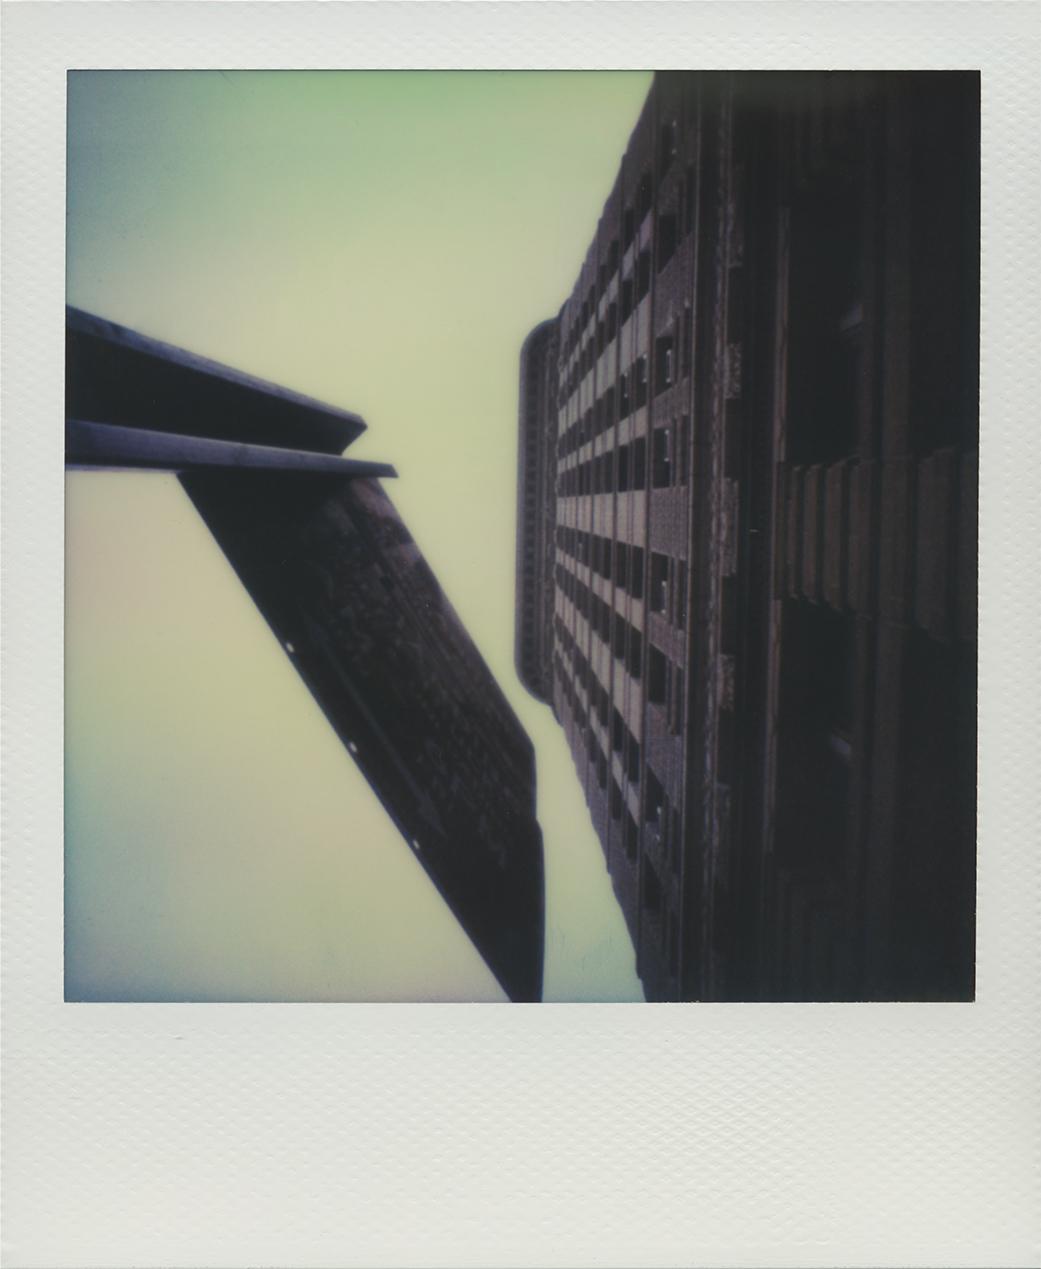 Nyc 2012 01d